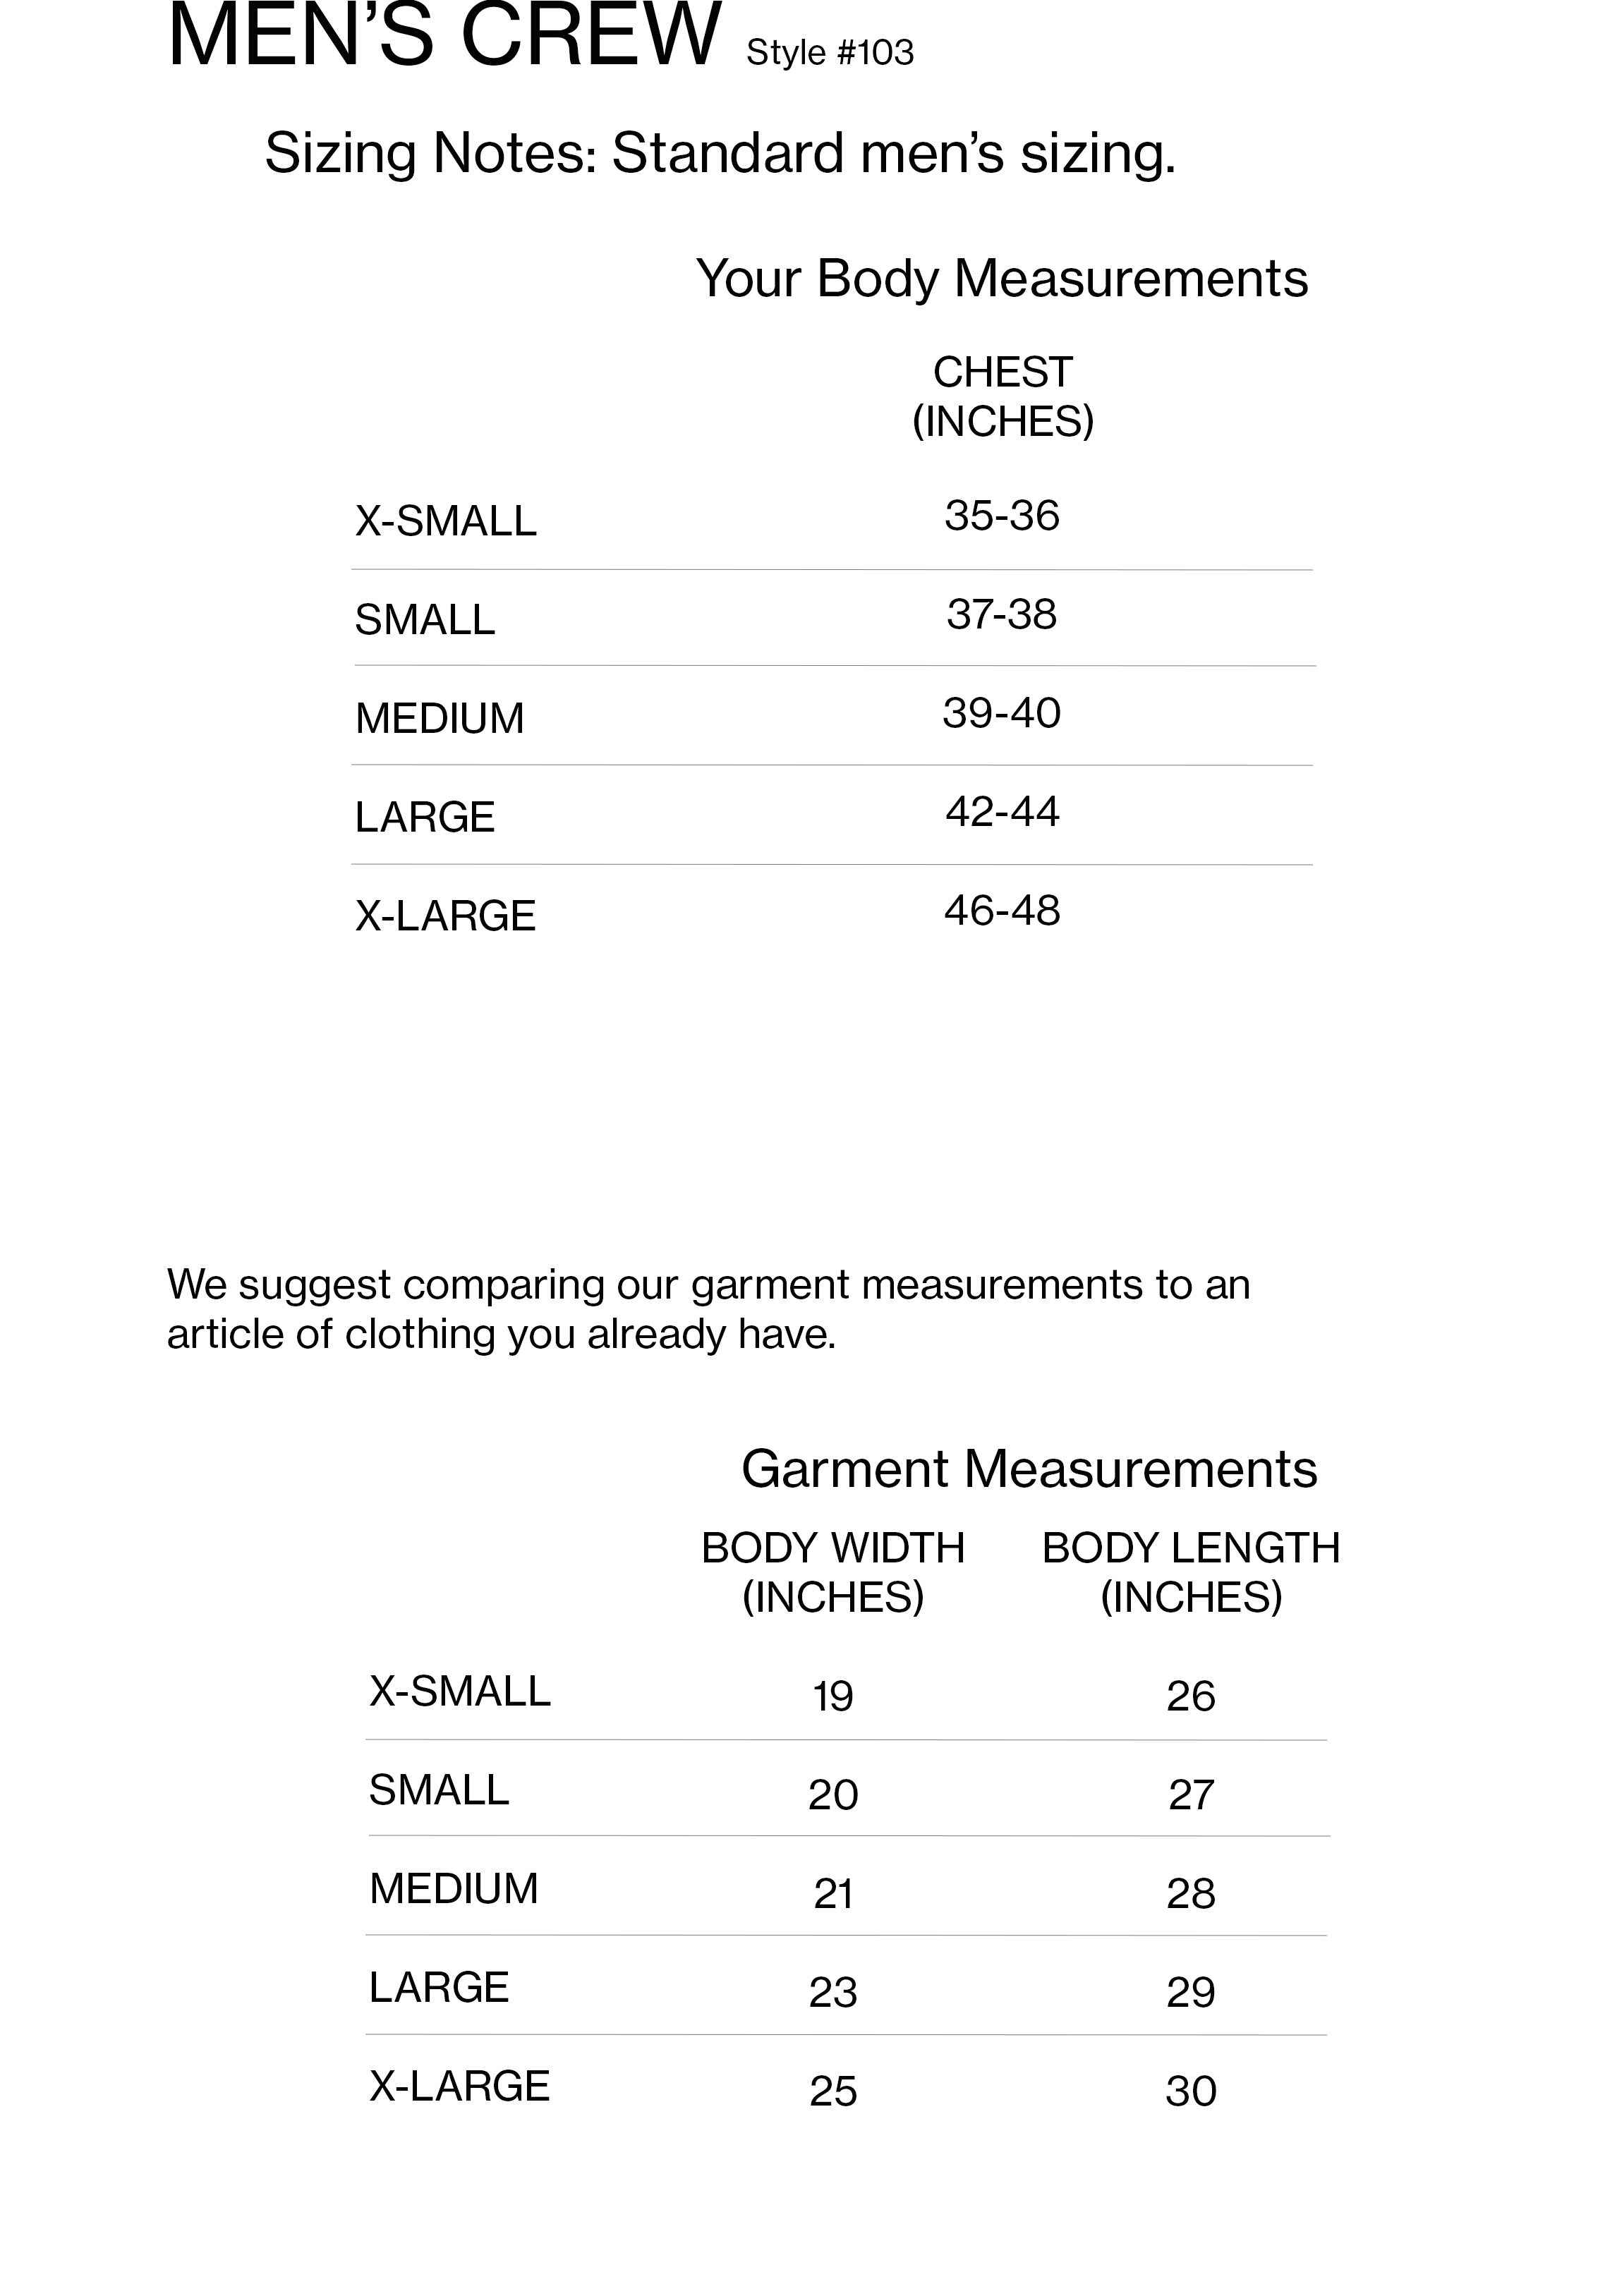 menscrewfinal.png